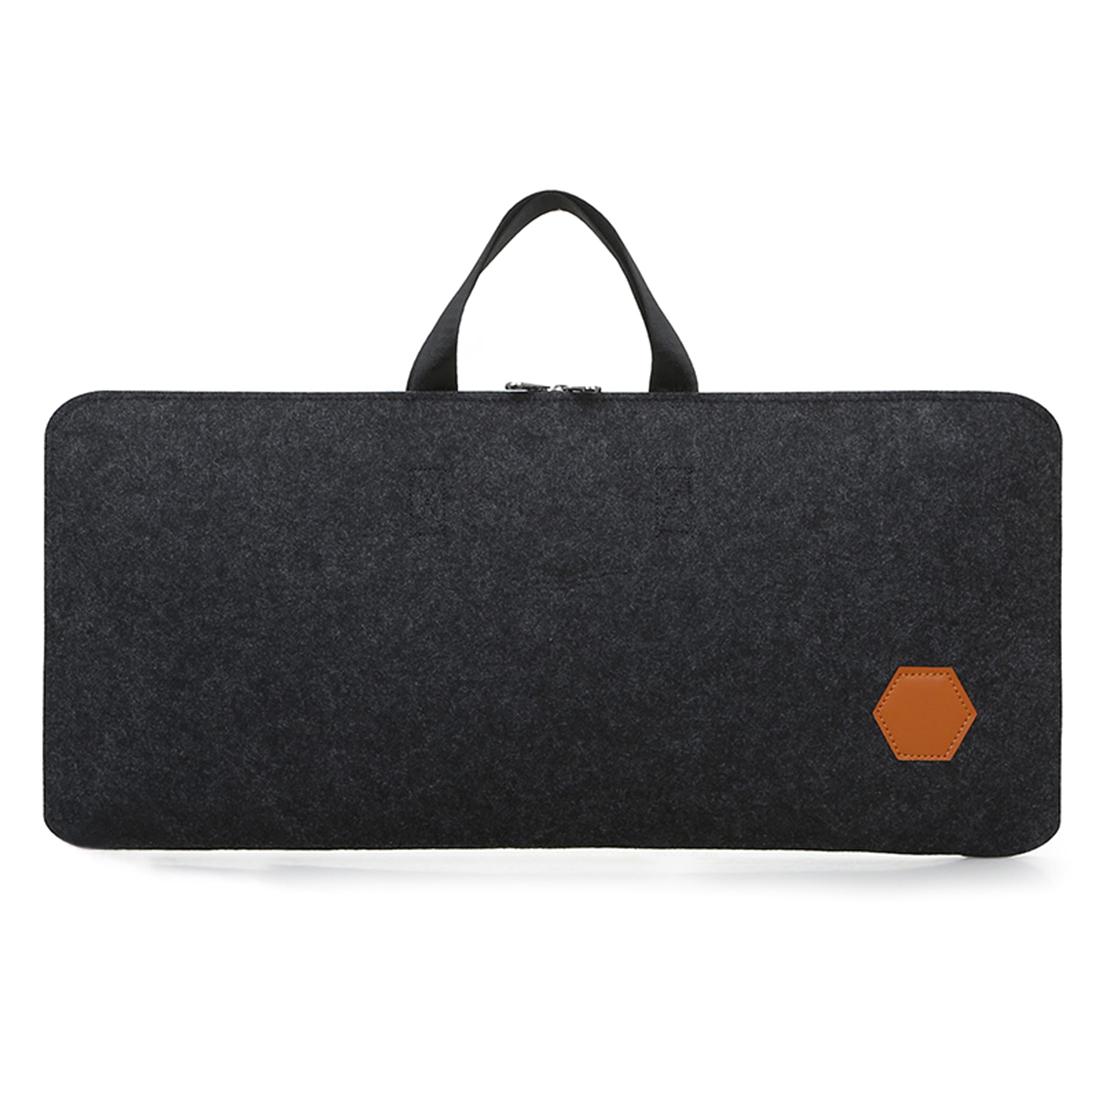 [47x18cm] 104/108 Keys Keyboard Carrying Bag Storage Bag